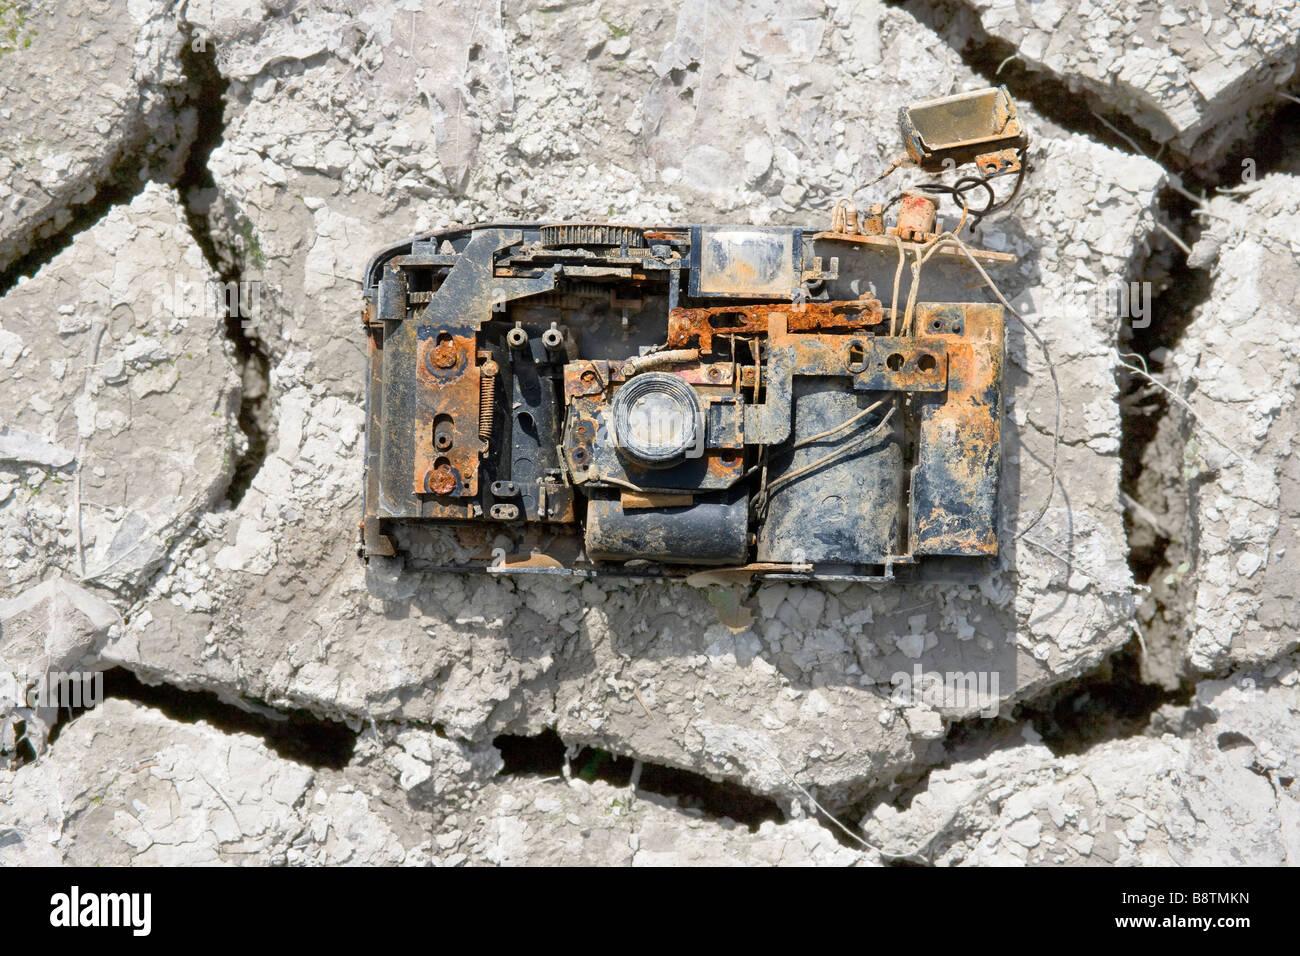 https://c7.alamy.com/comp/B8TMKN/broken-discarded-35mm-photo-camera-at-the-bottom-of-a-lake-thats-now-B8TMKN.jpg